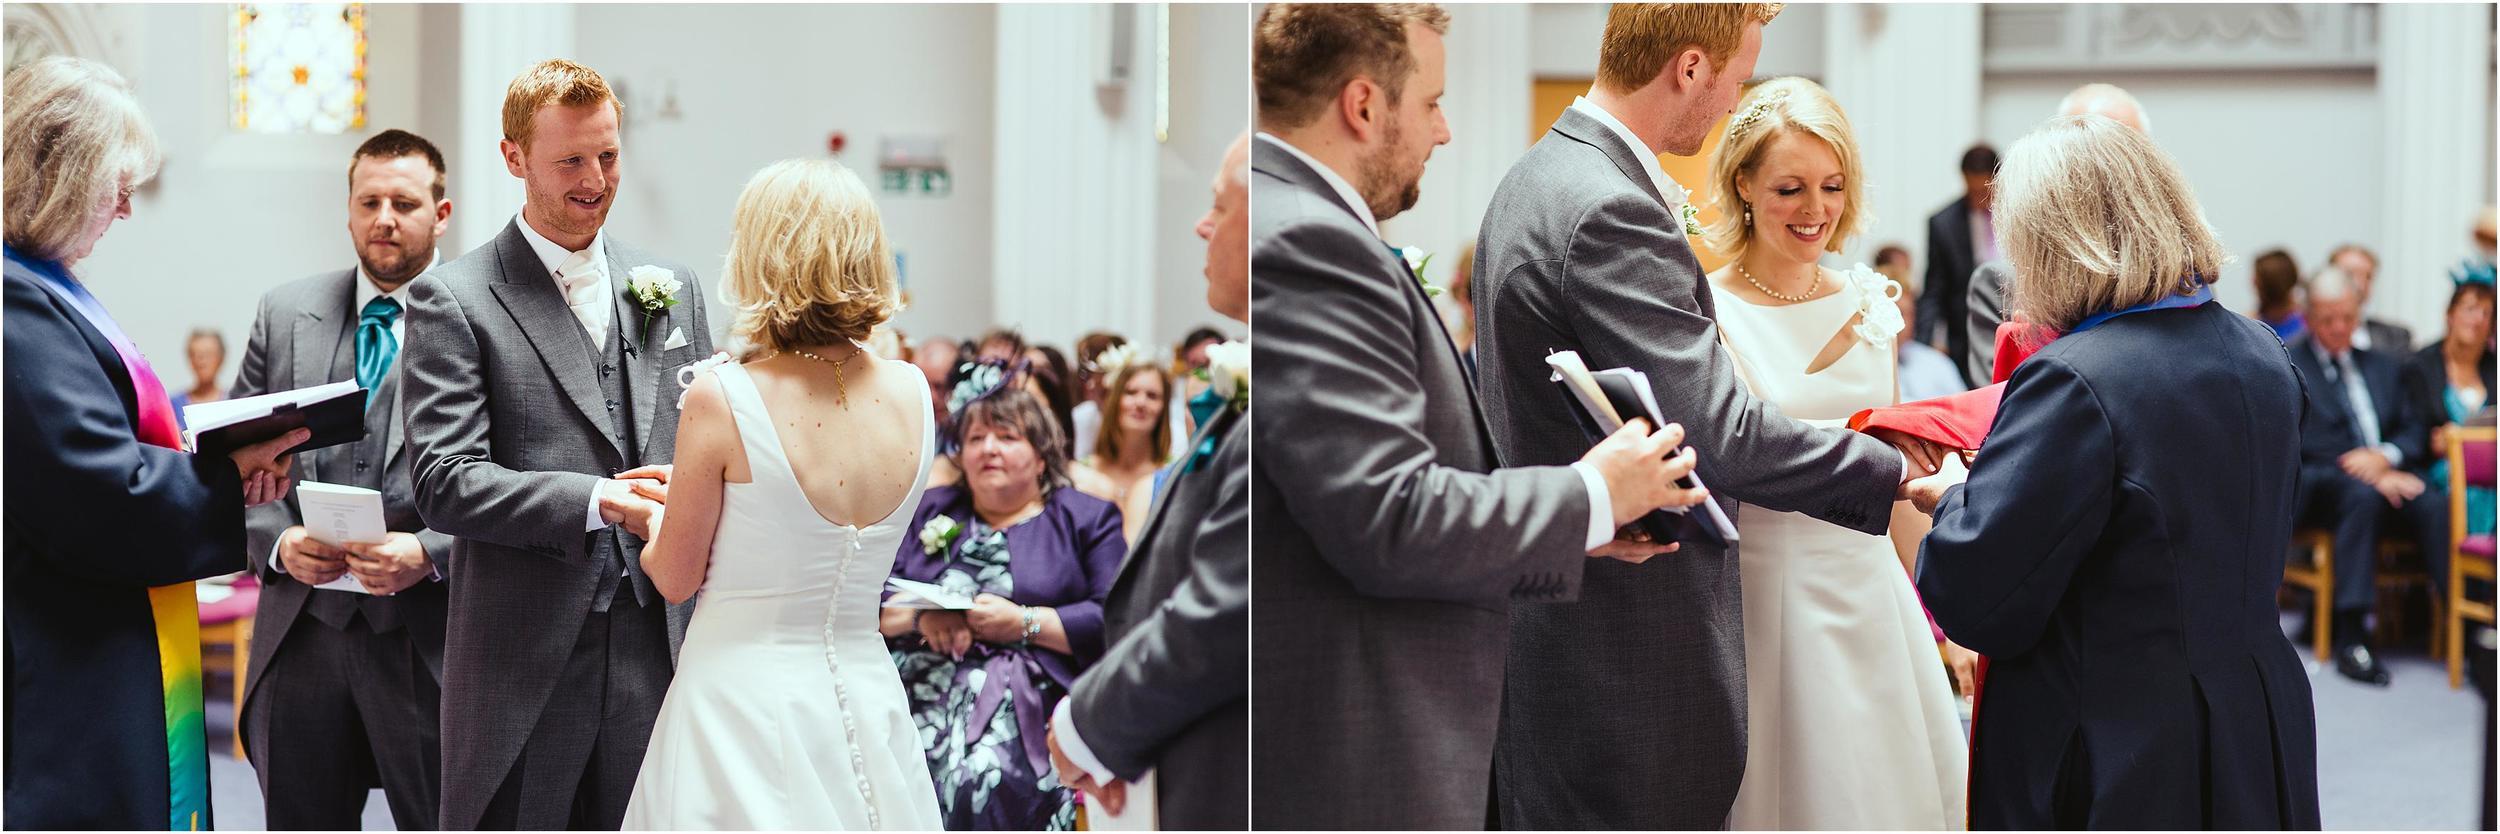 winchester wedding photographer_0023.jpg